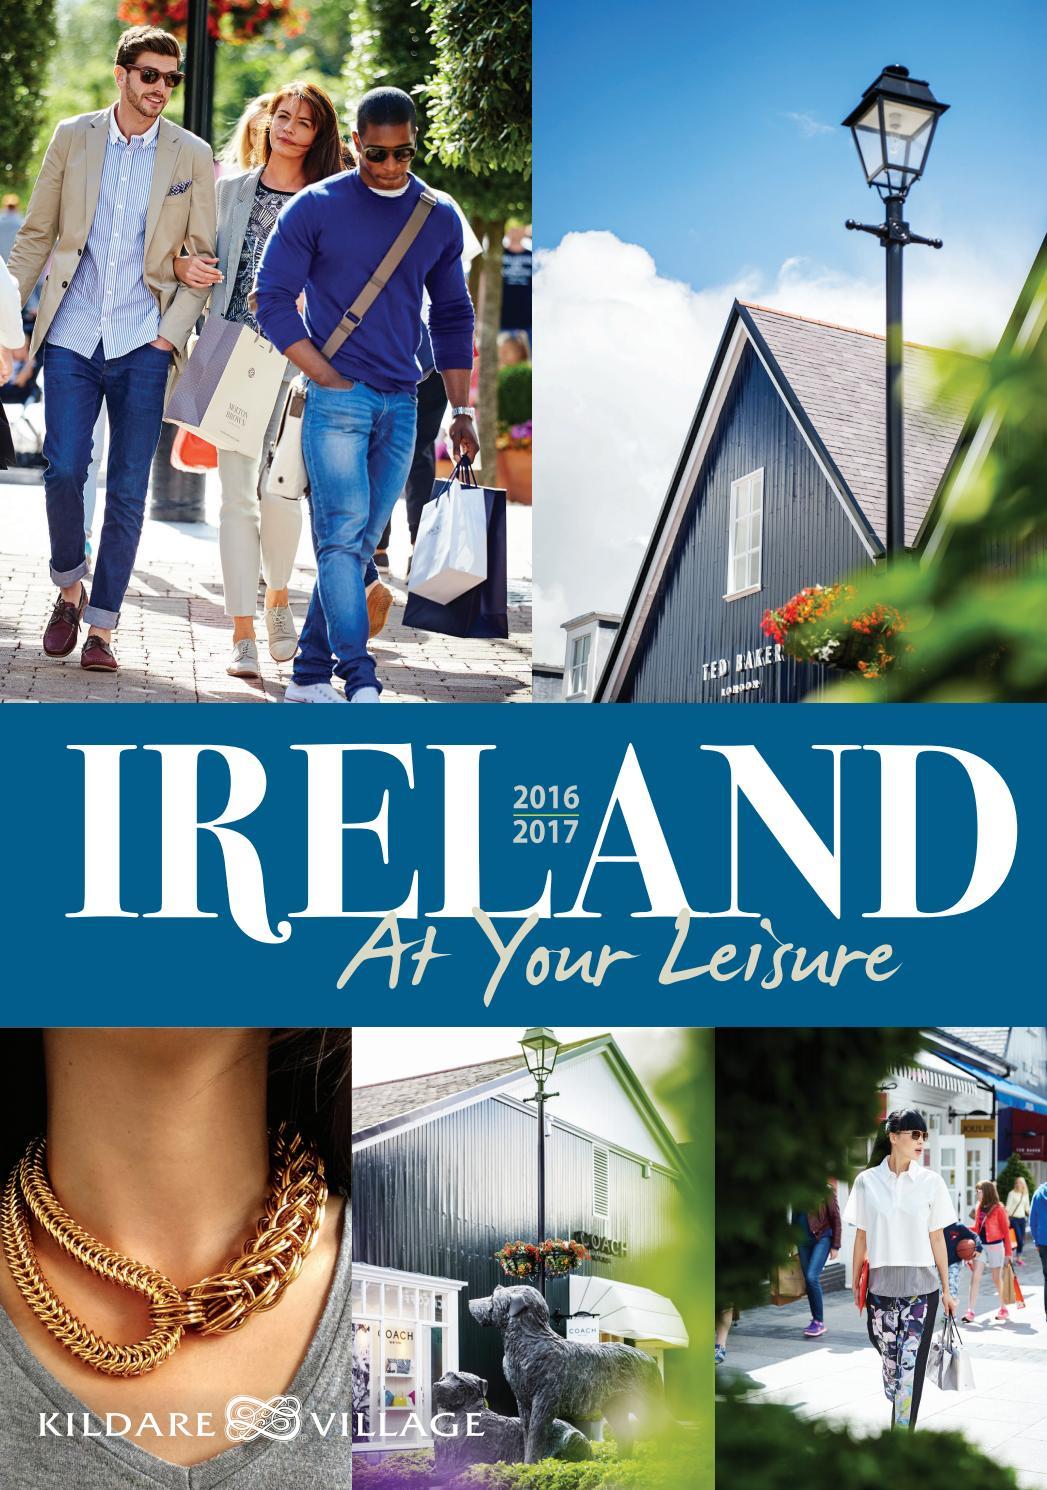 Michelin awards 2019: Full list of Irish restaurants and what